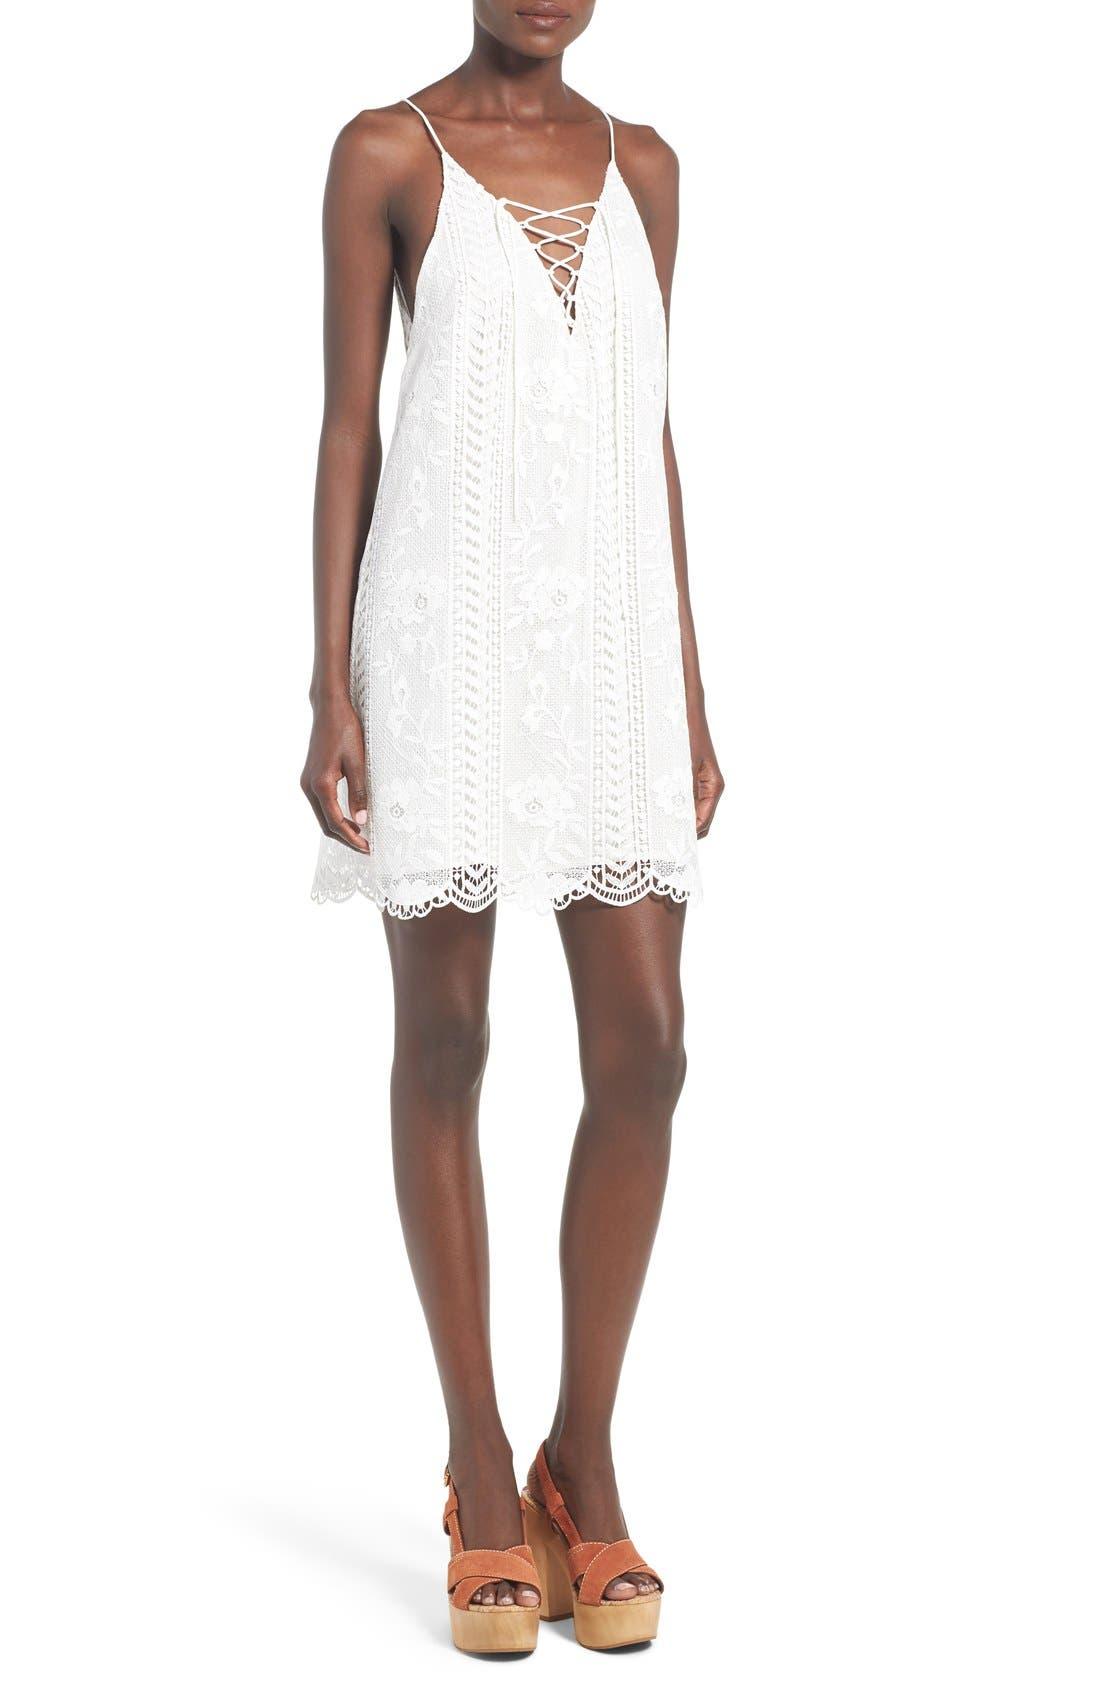 Alternate Image 1 Selected - ASTR Lace-Up Shift Dress